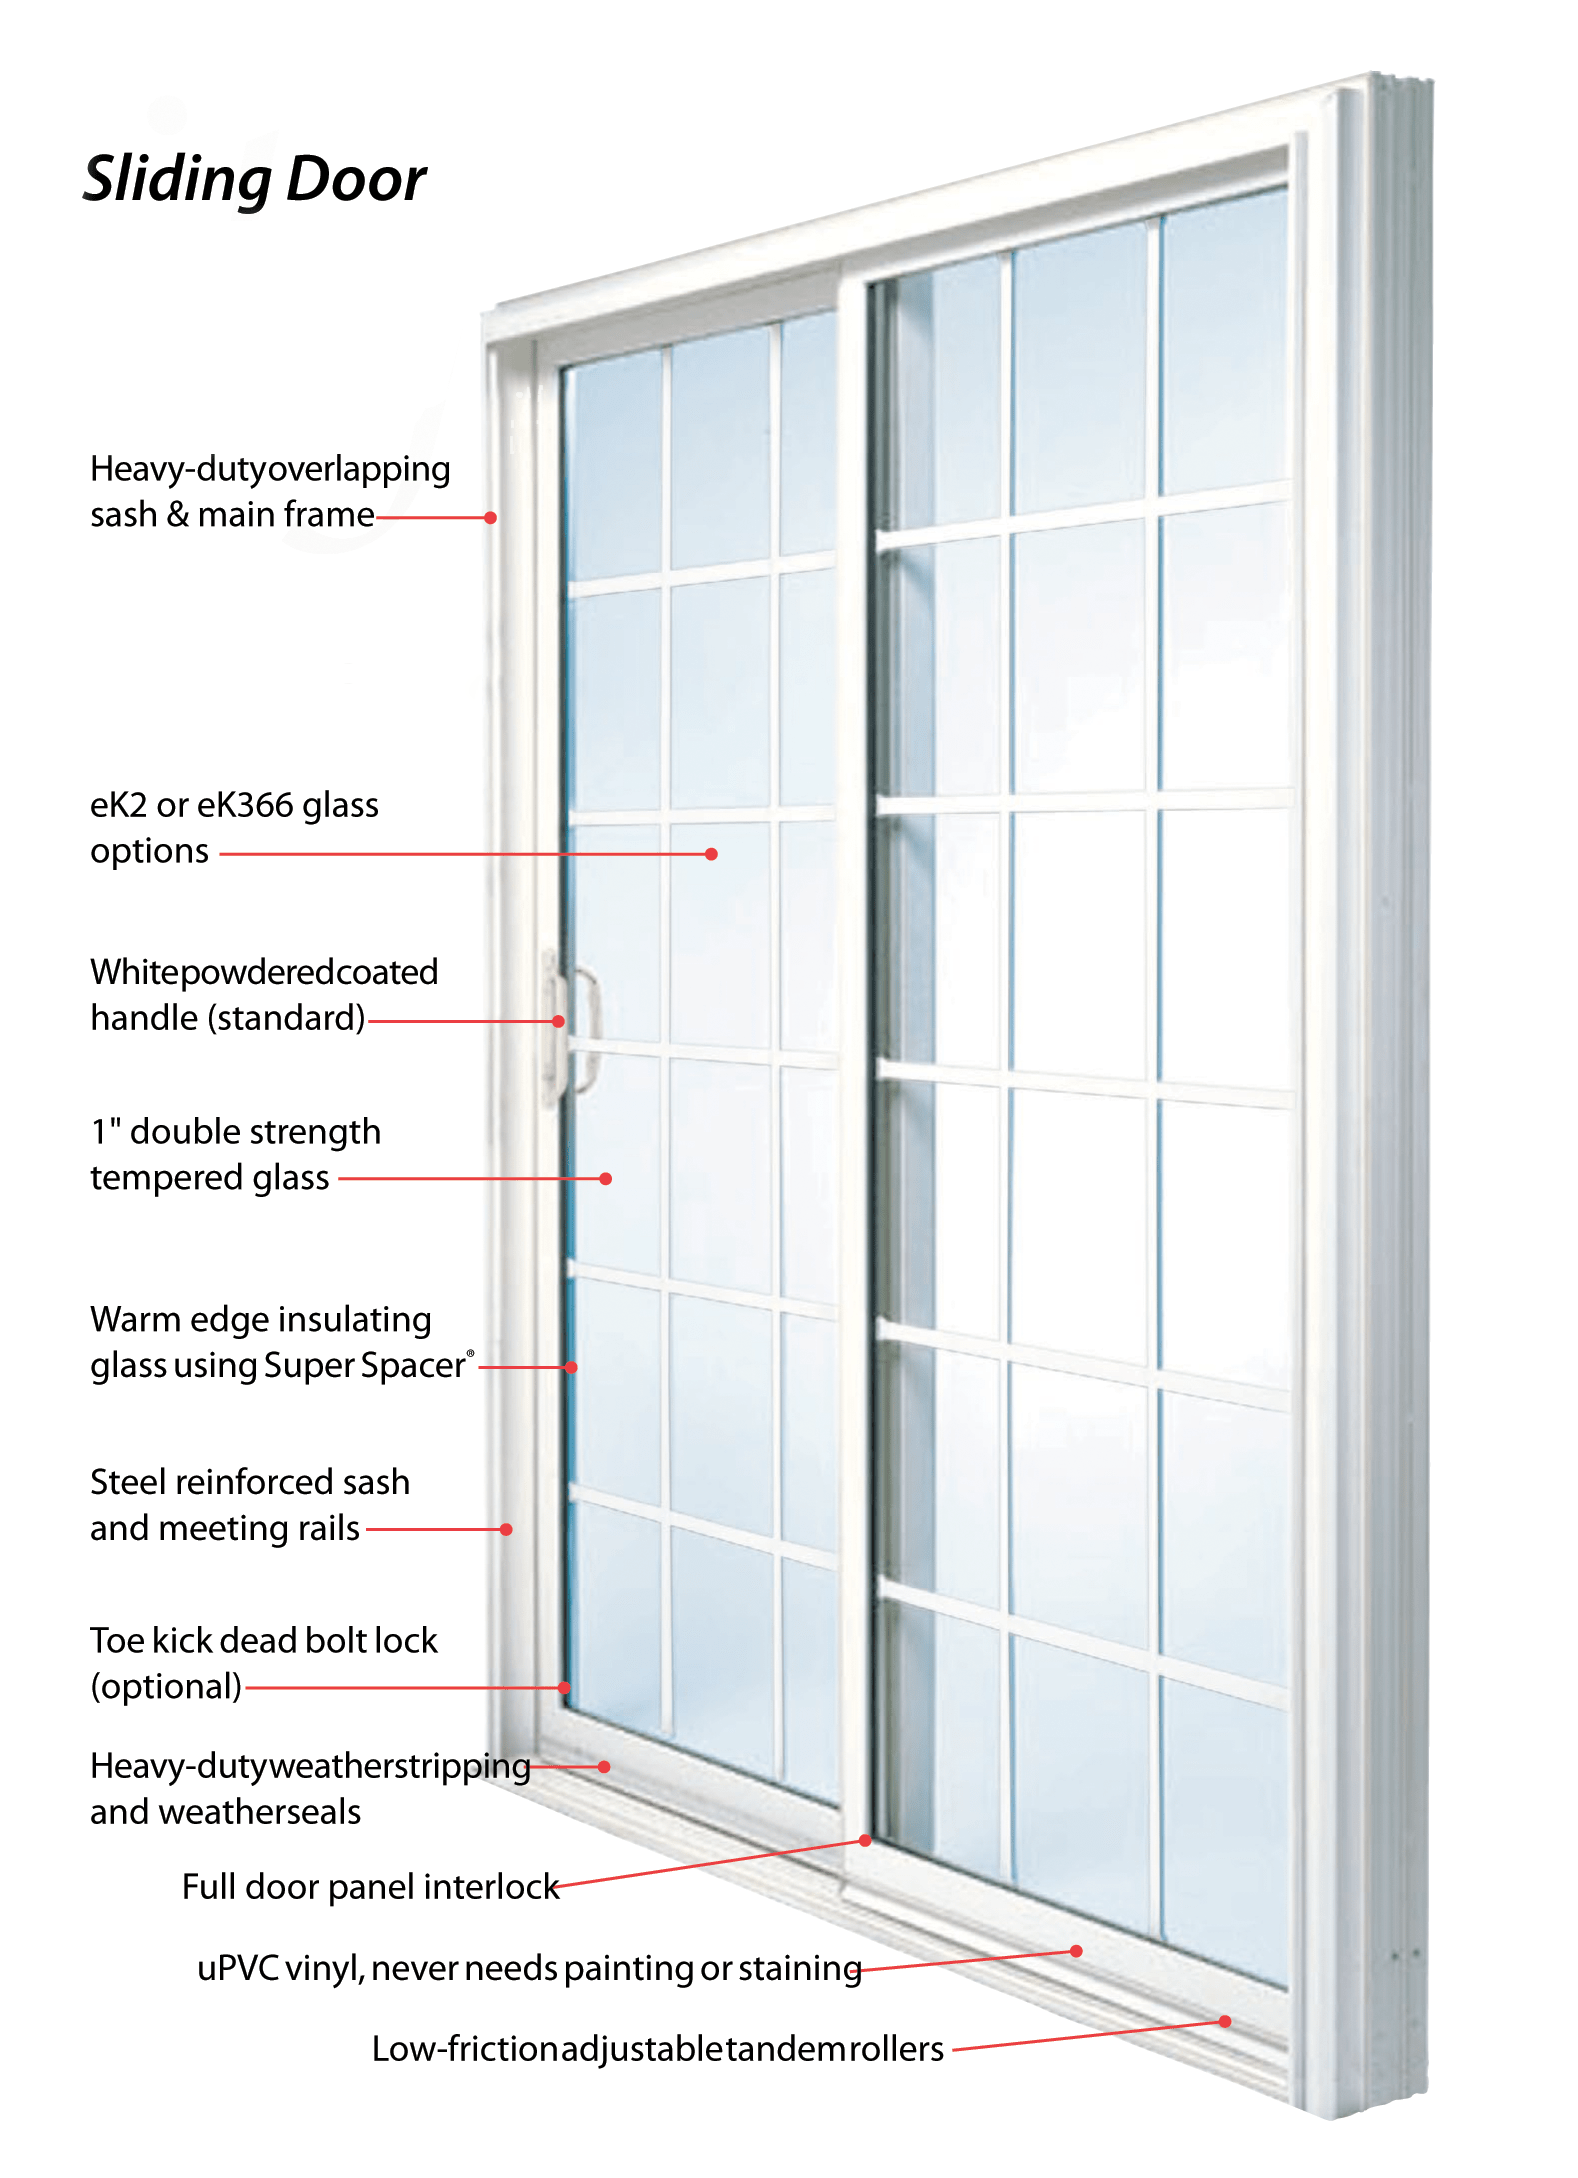 Sliding Door Installaton